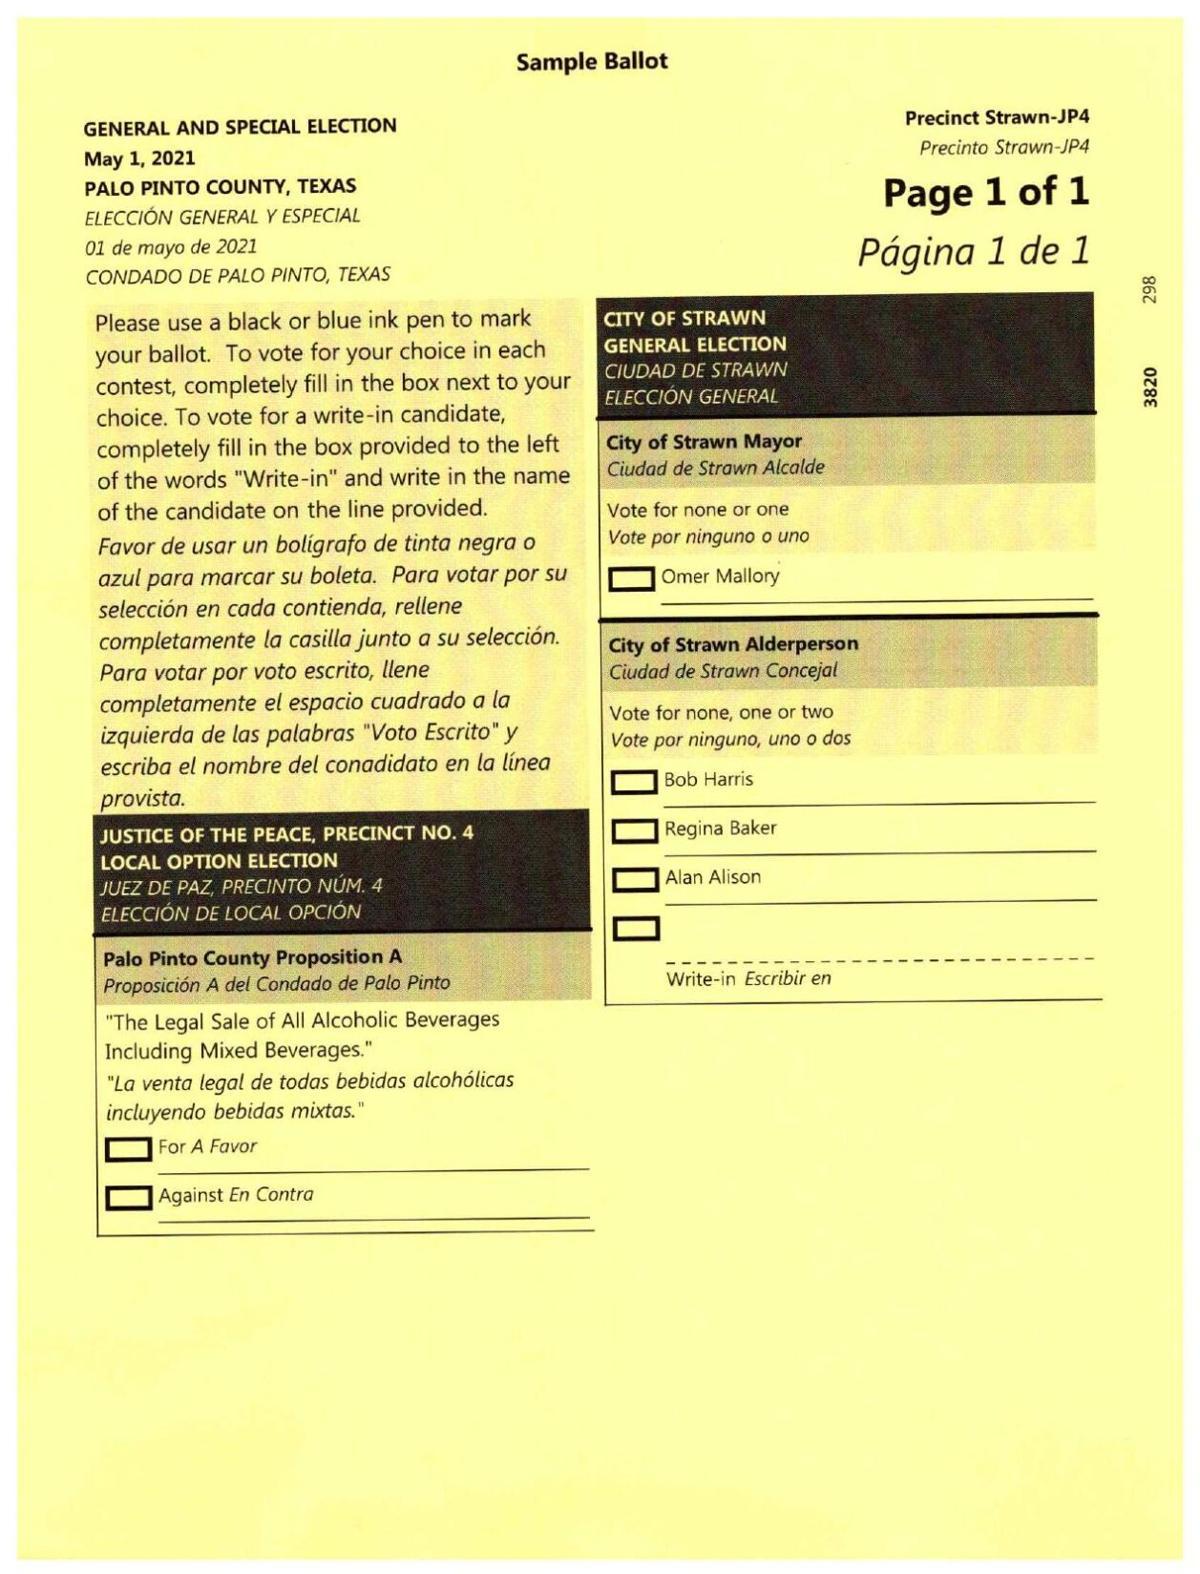 Palo Pinto County sample ballots